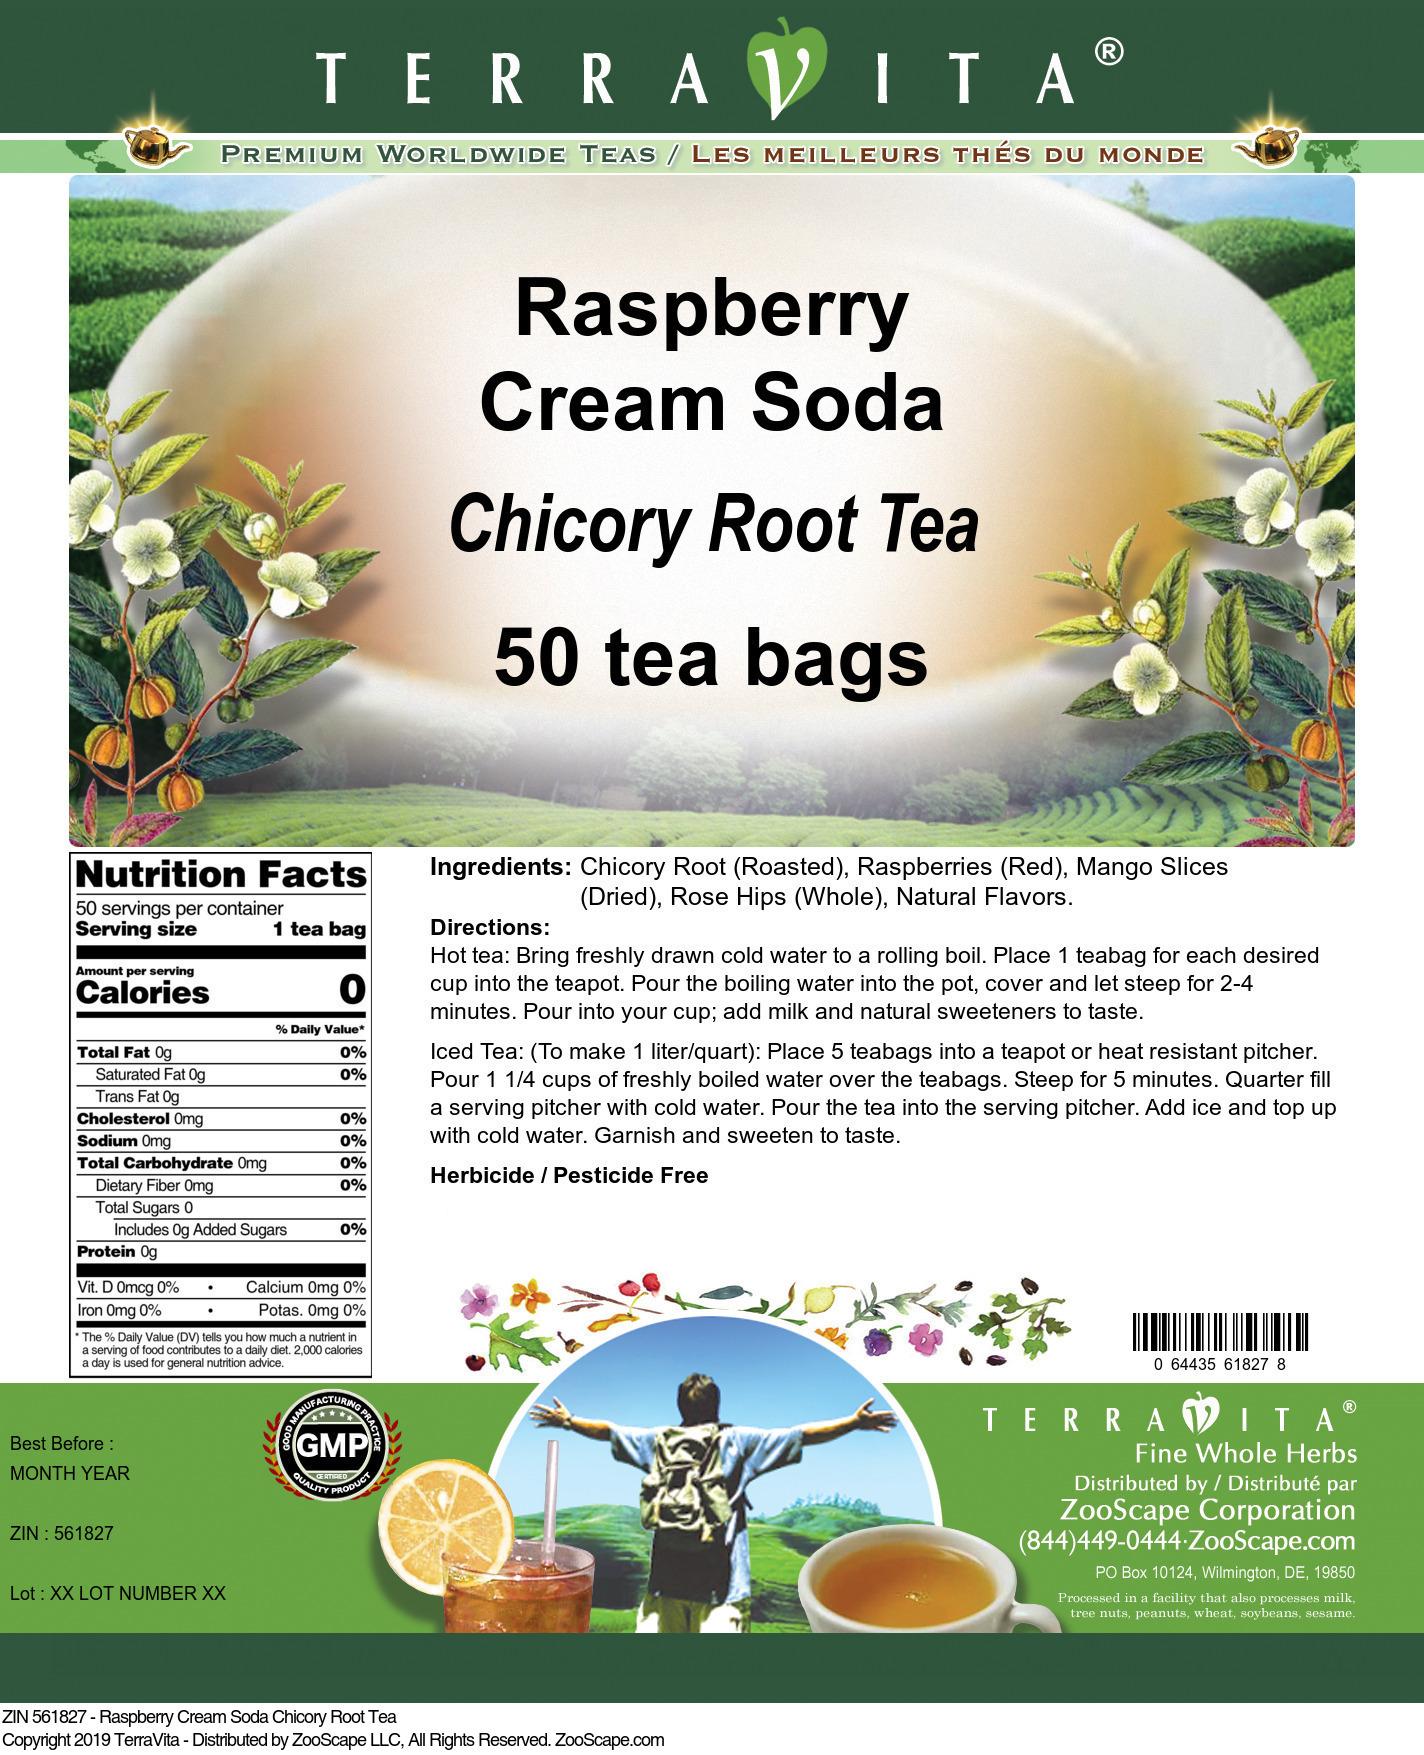 Raspberry Cream Soda Chicory Root Tea